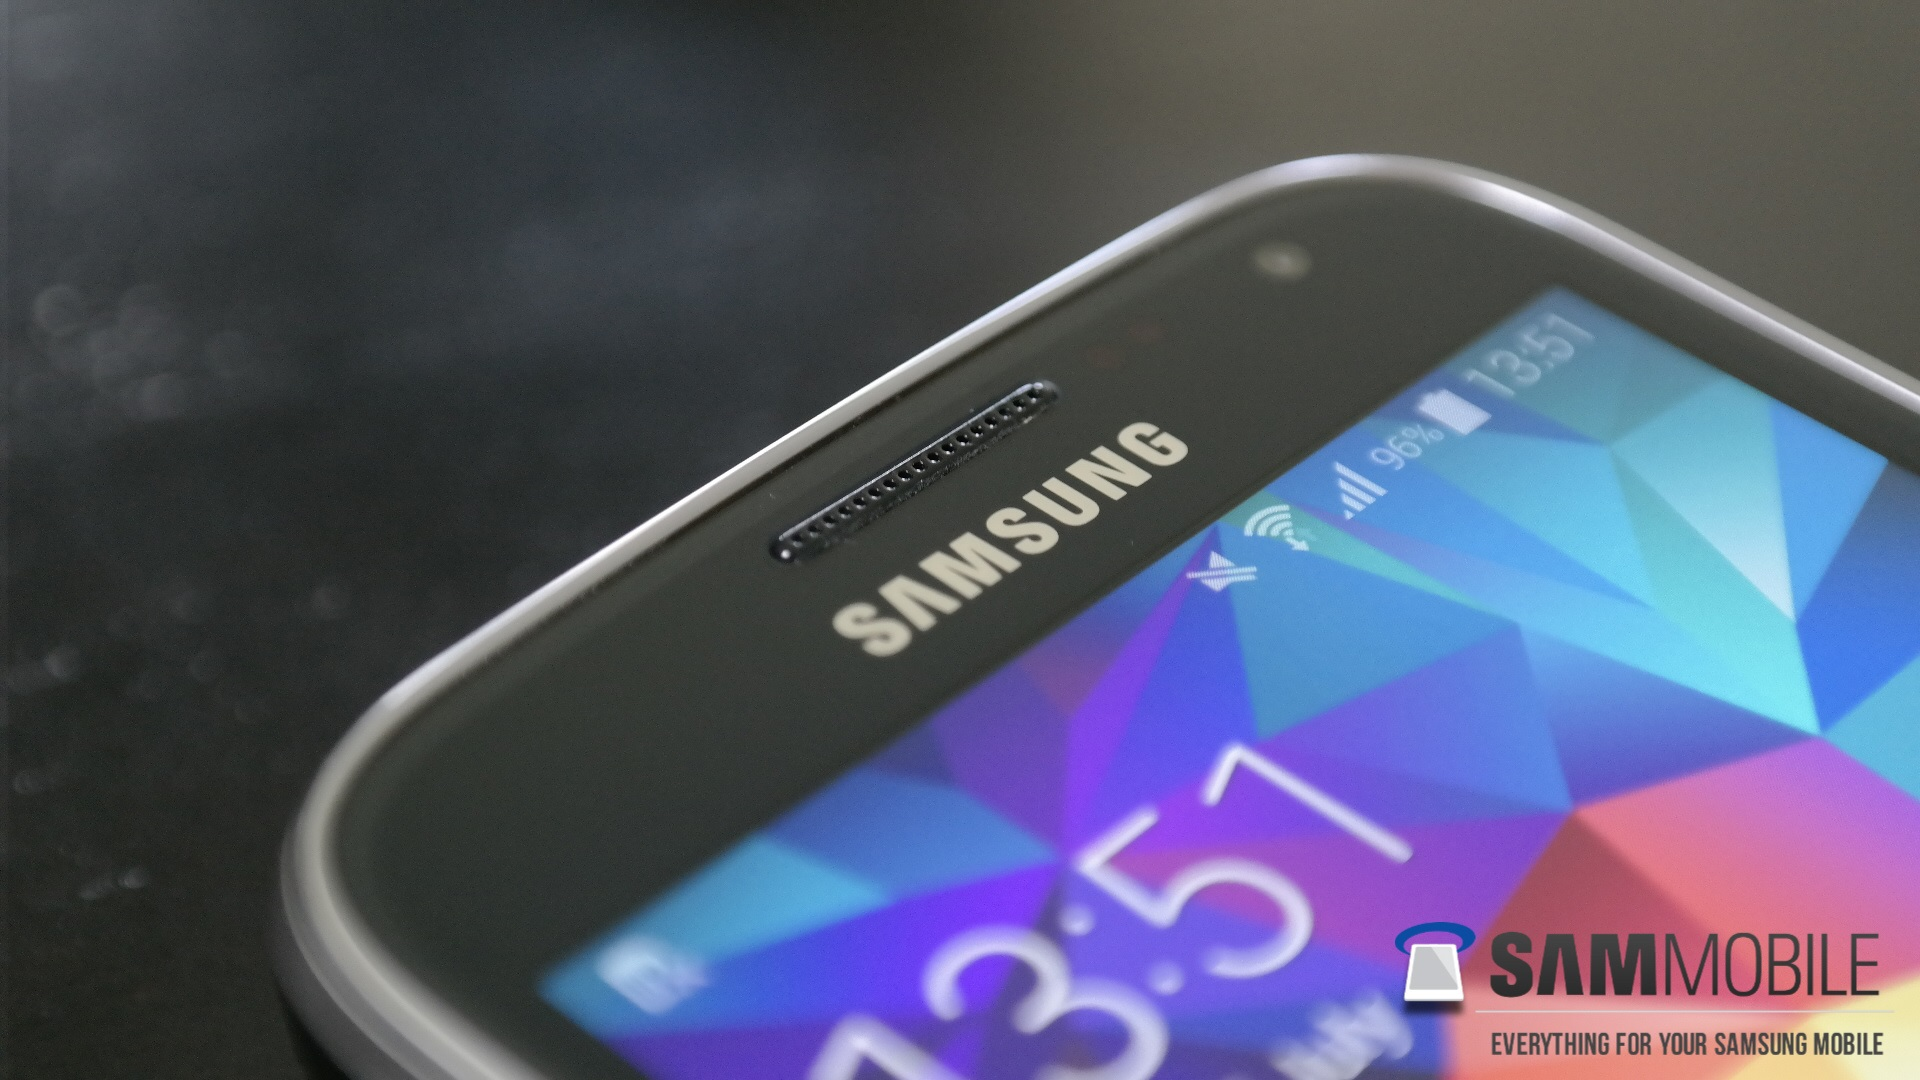 Review Samsung Galaxy K Zoom Sammobile 8gb Black Display